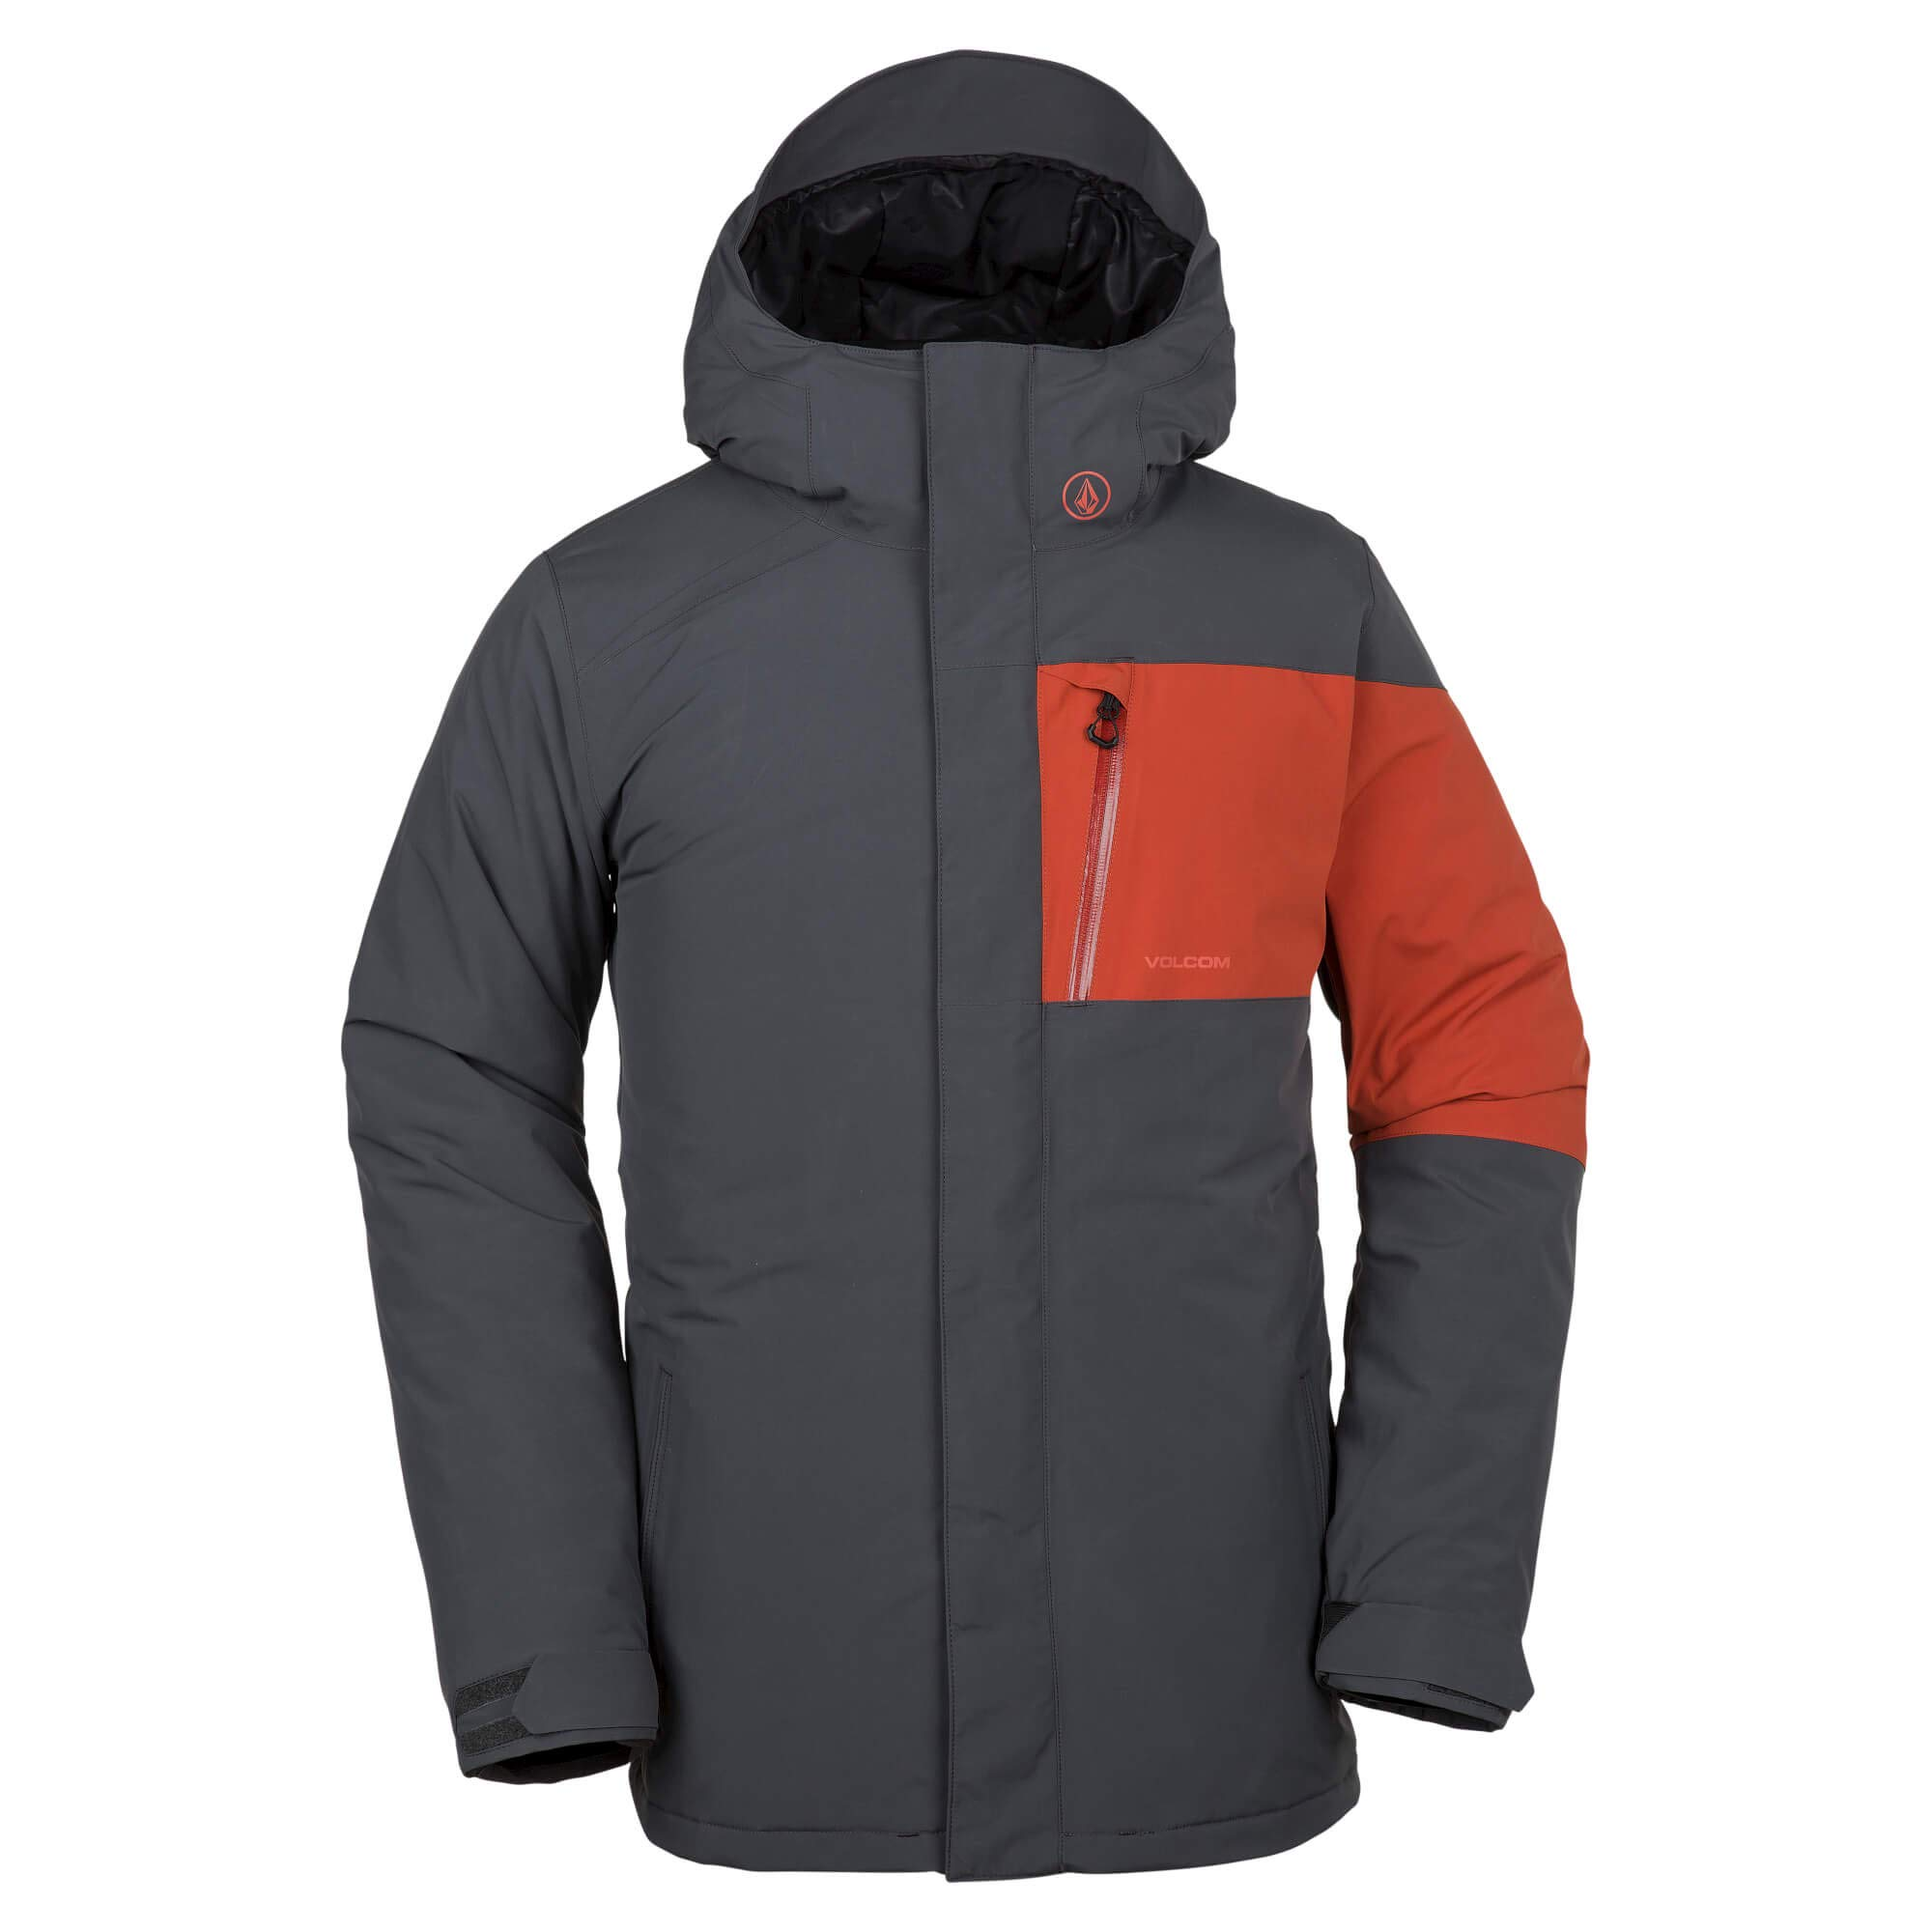 Volcom Men's L Gore-Tex 2 Layer Laminate Snow Jacket, Vintage Black Large